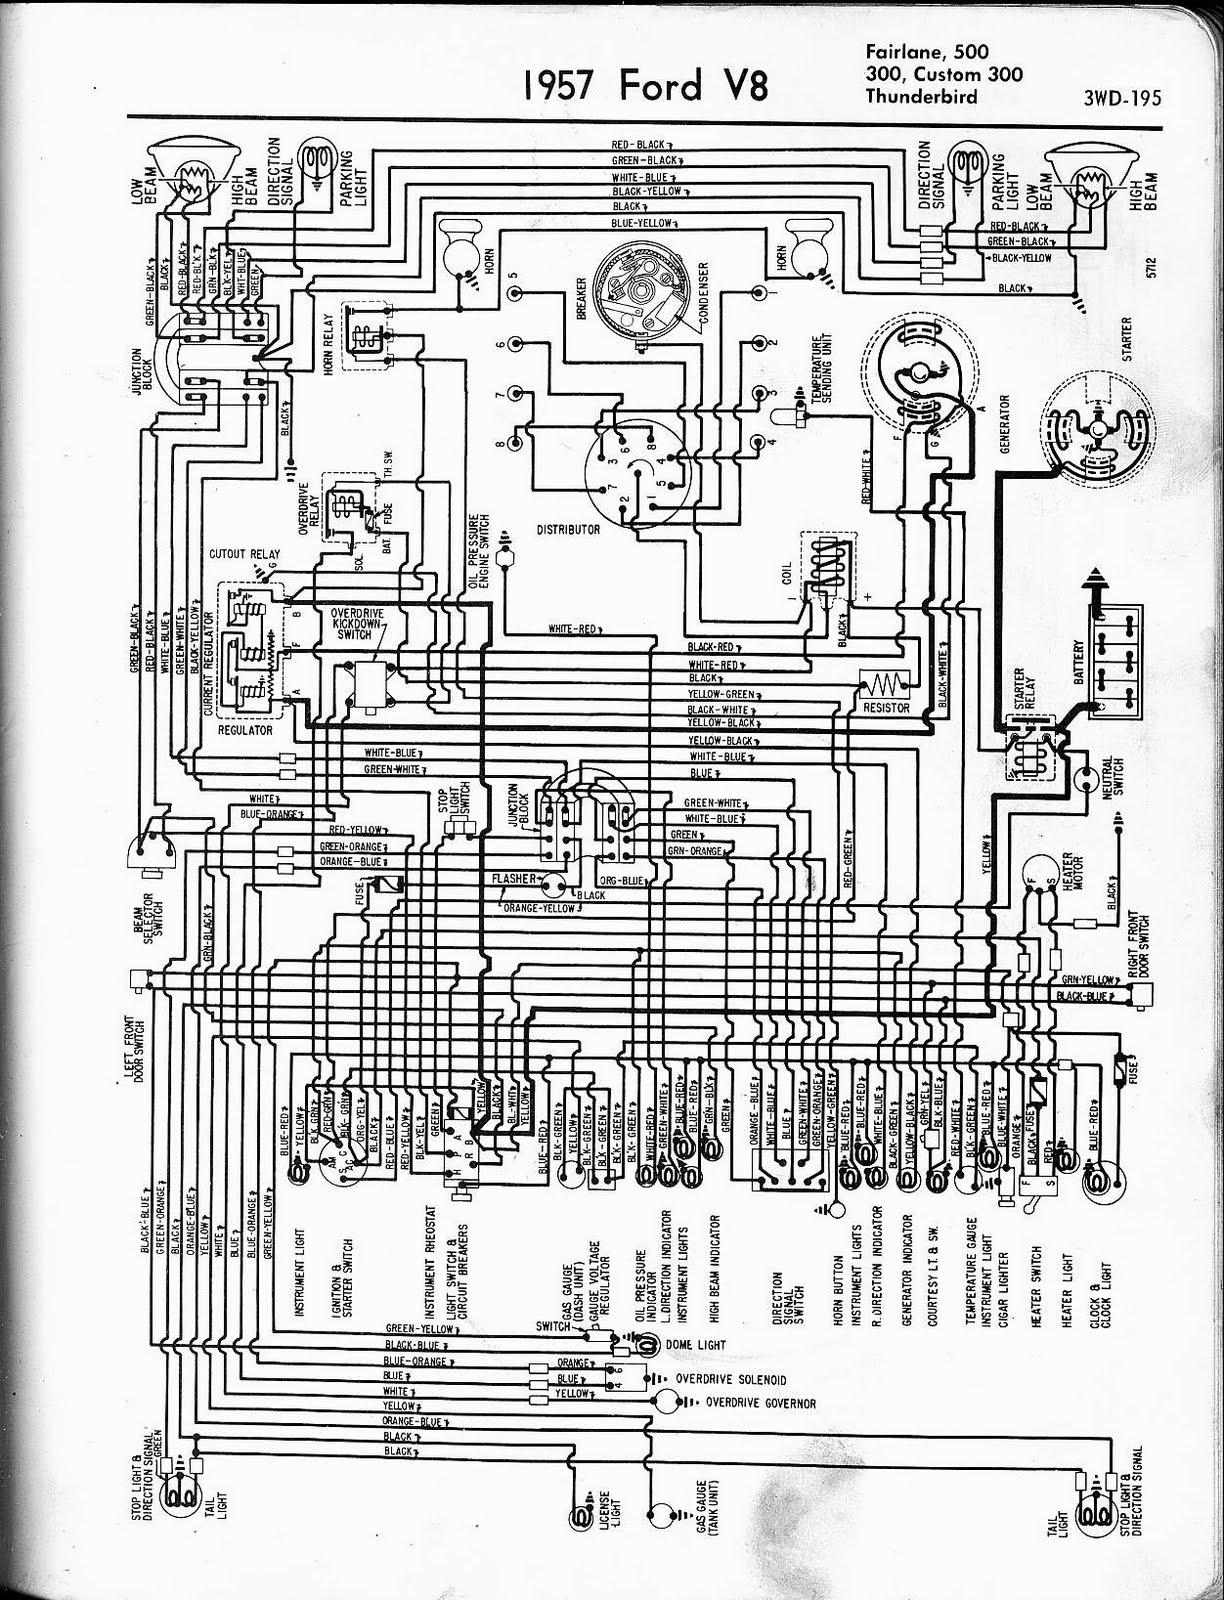 diesel generator control panel wiring diagram steel phase change free auto diagram: 1957 ford v8 fairlane, custom300, or thunderbird